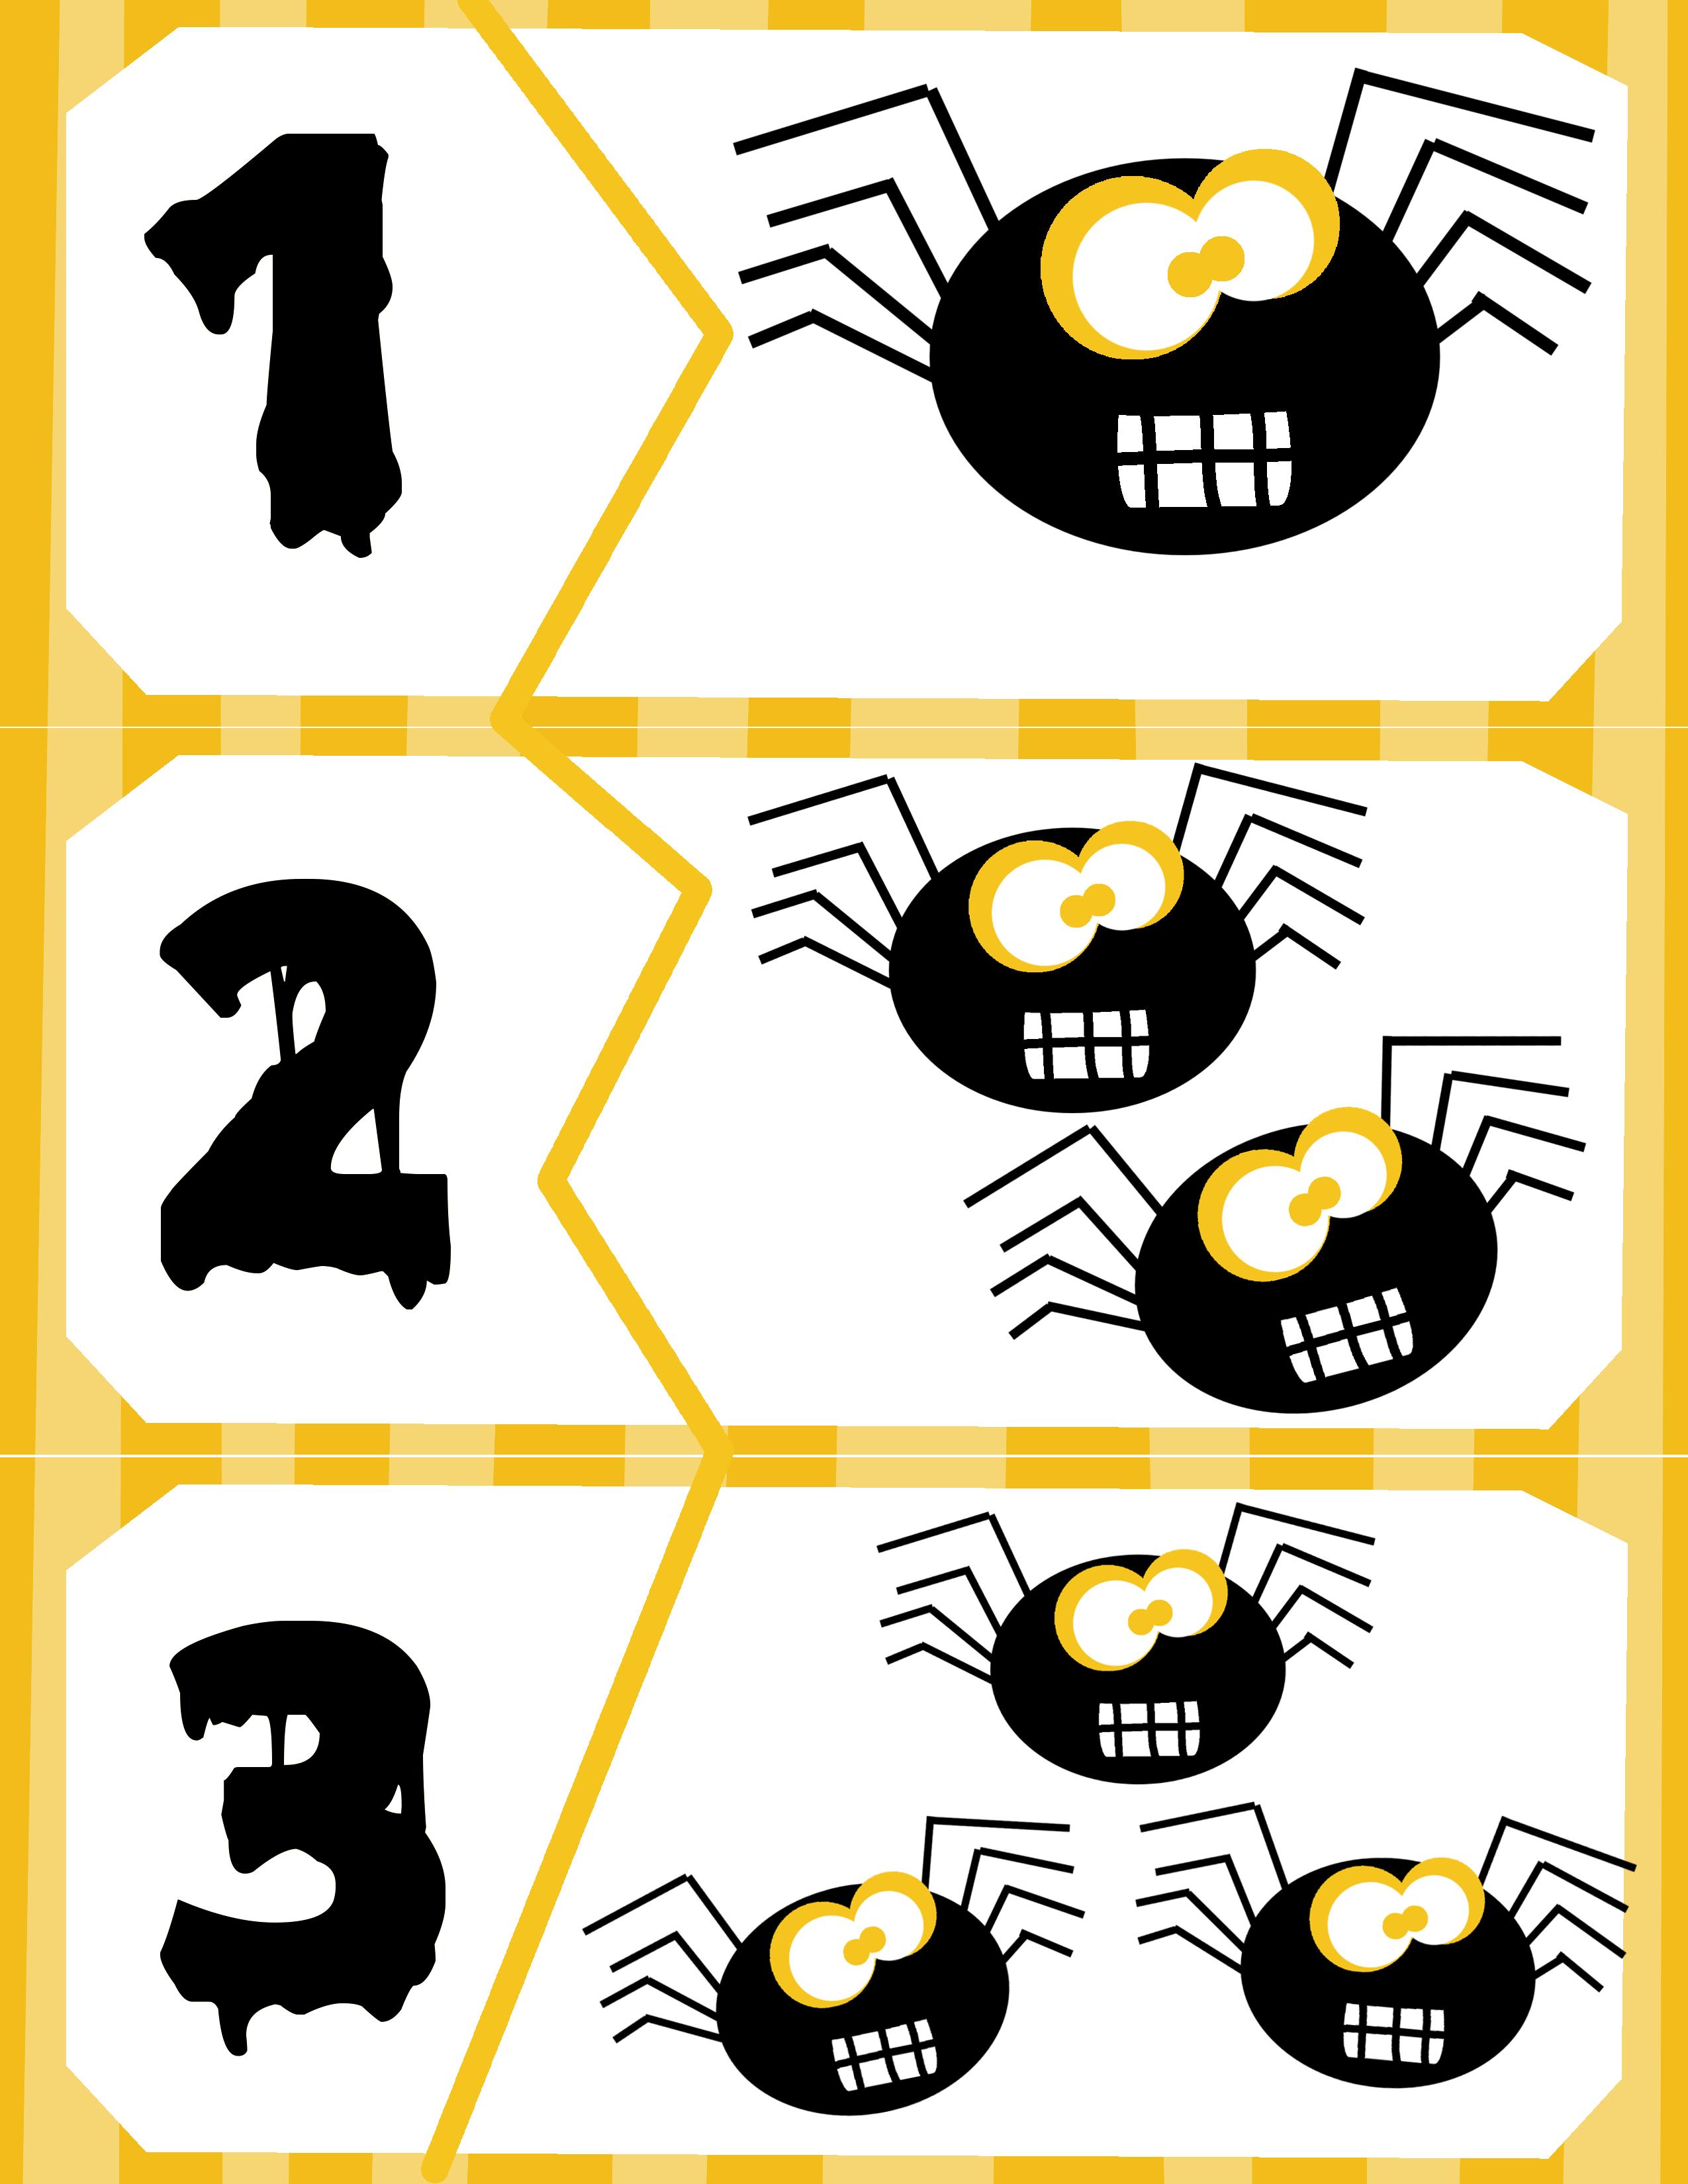 Spider Count